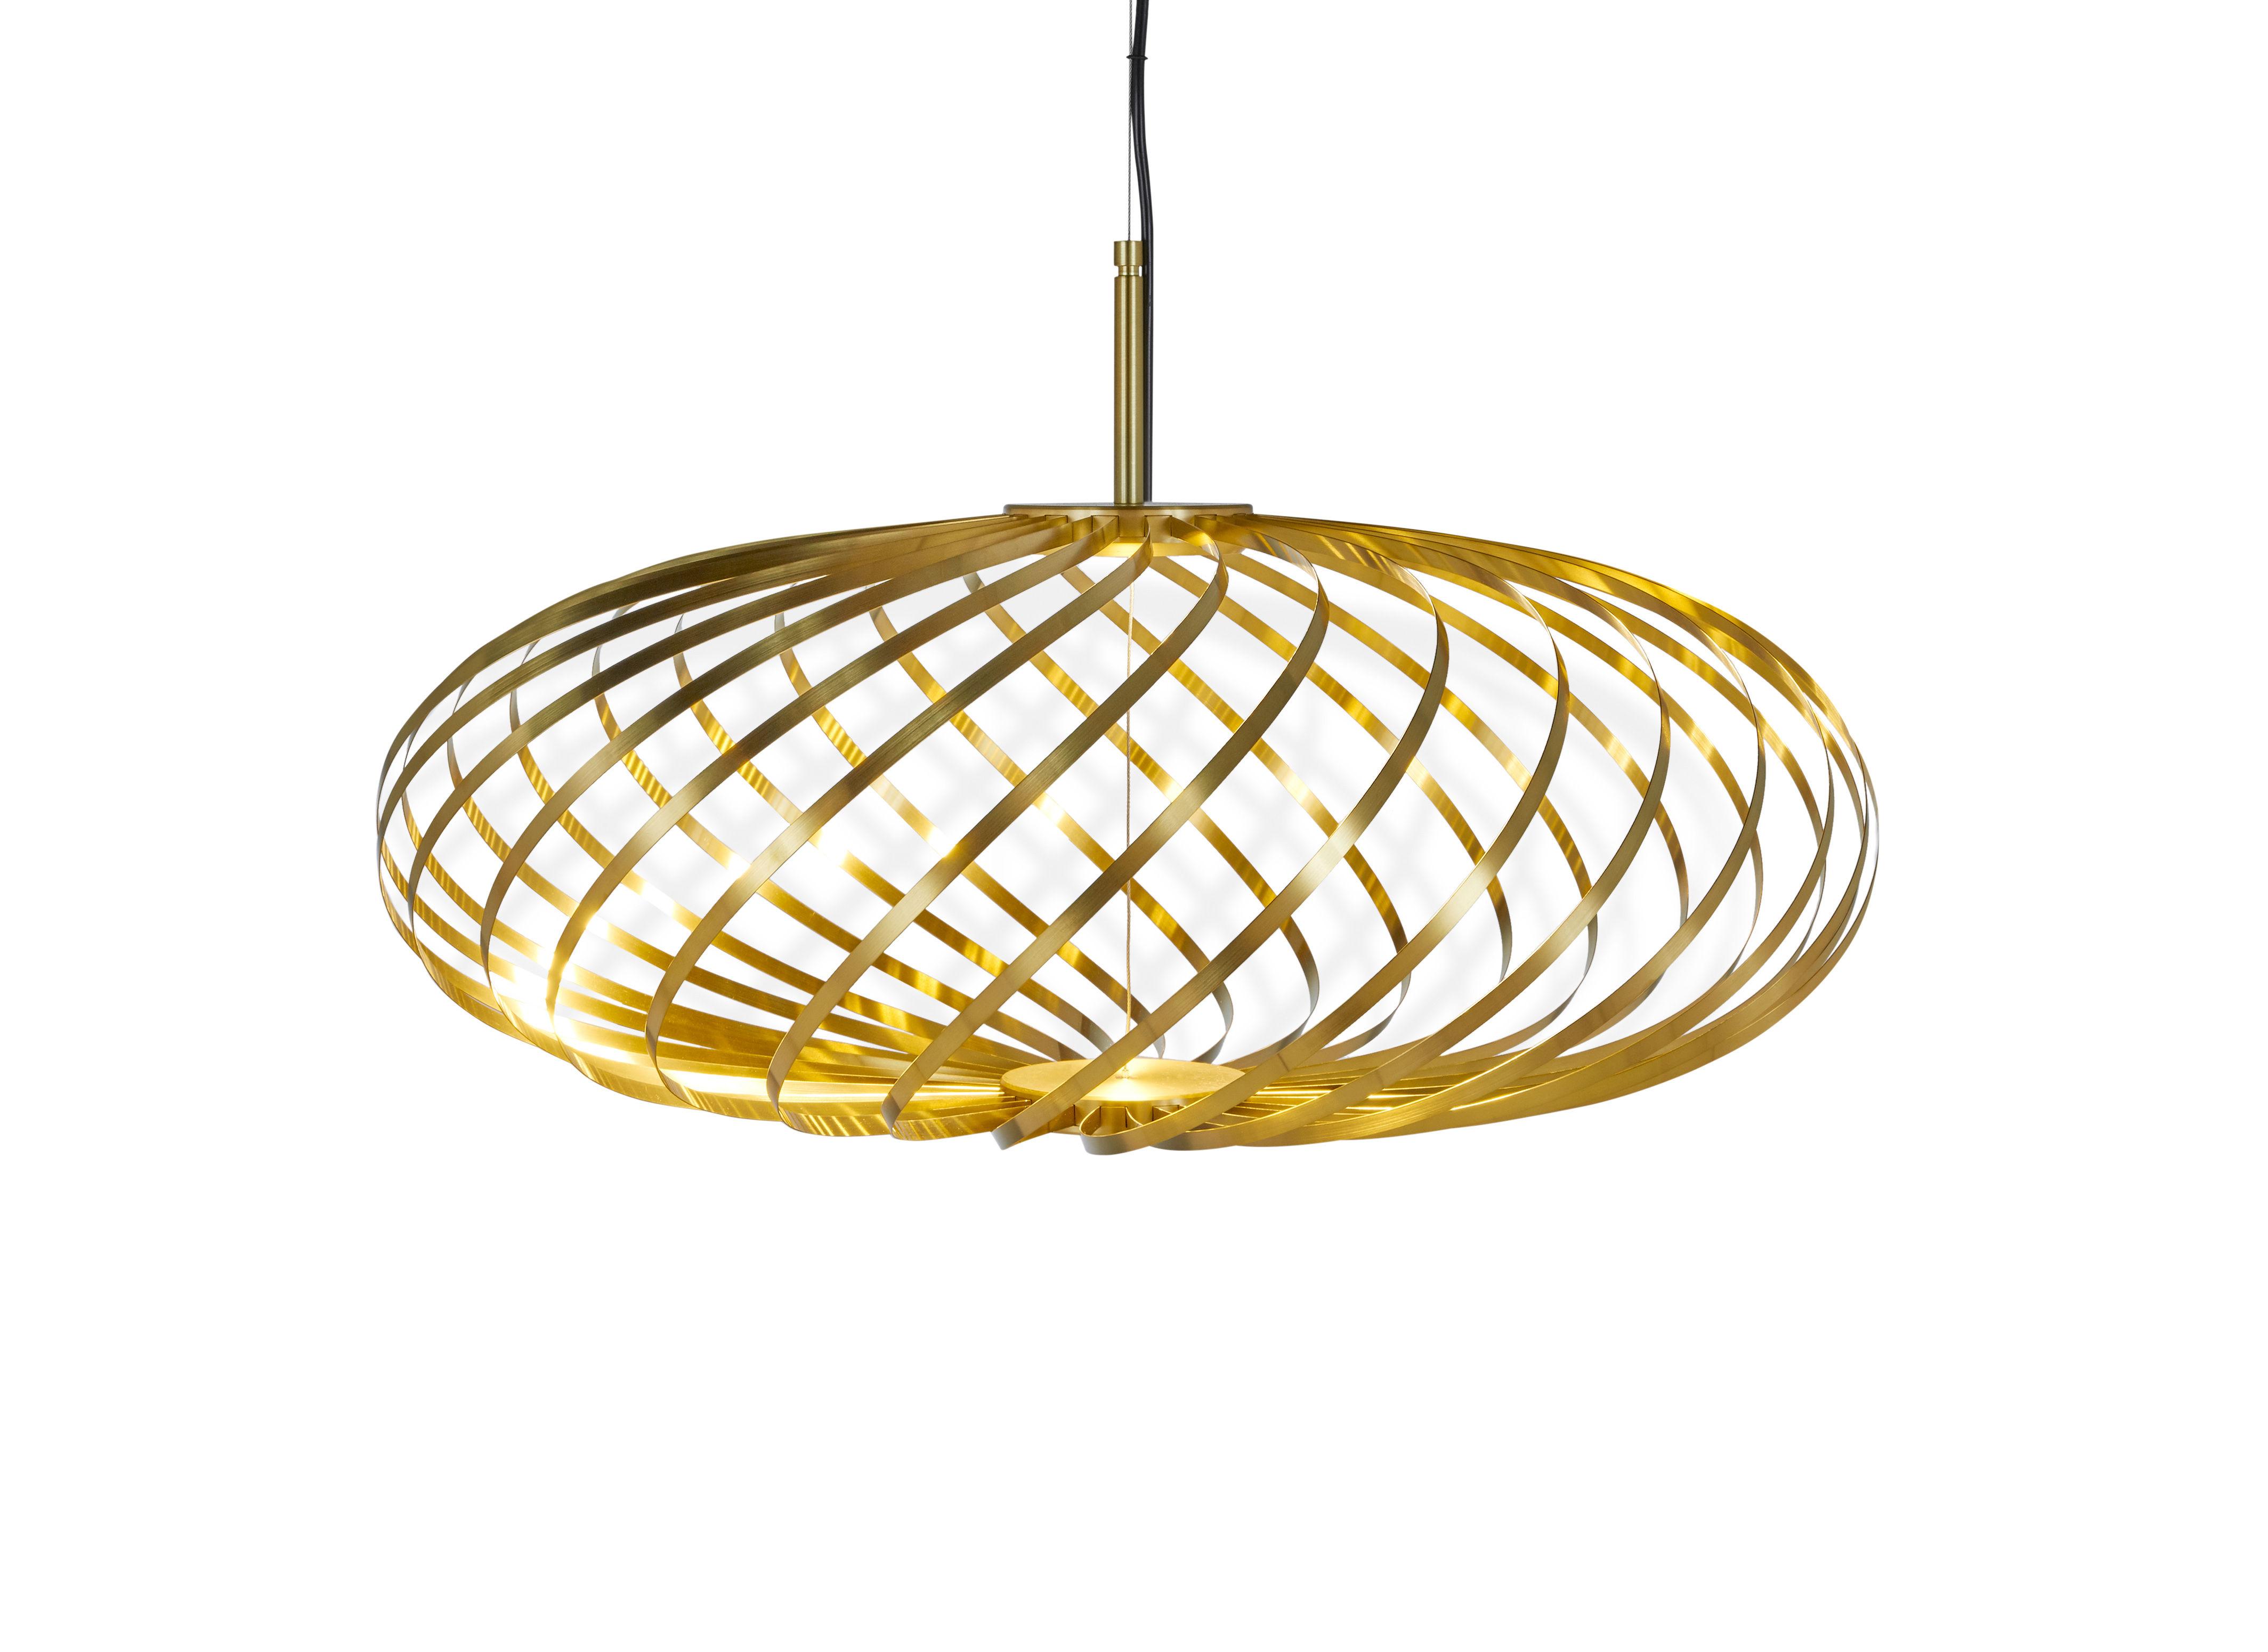 Lighting - Pendant Lighting - Spring Small LED Pendant - / Ø 56 x H 24 cm -Adjustable steel strips by Tom Dixon - Brass - Stainless steel